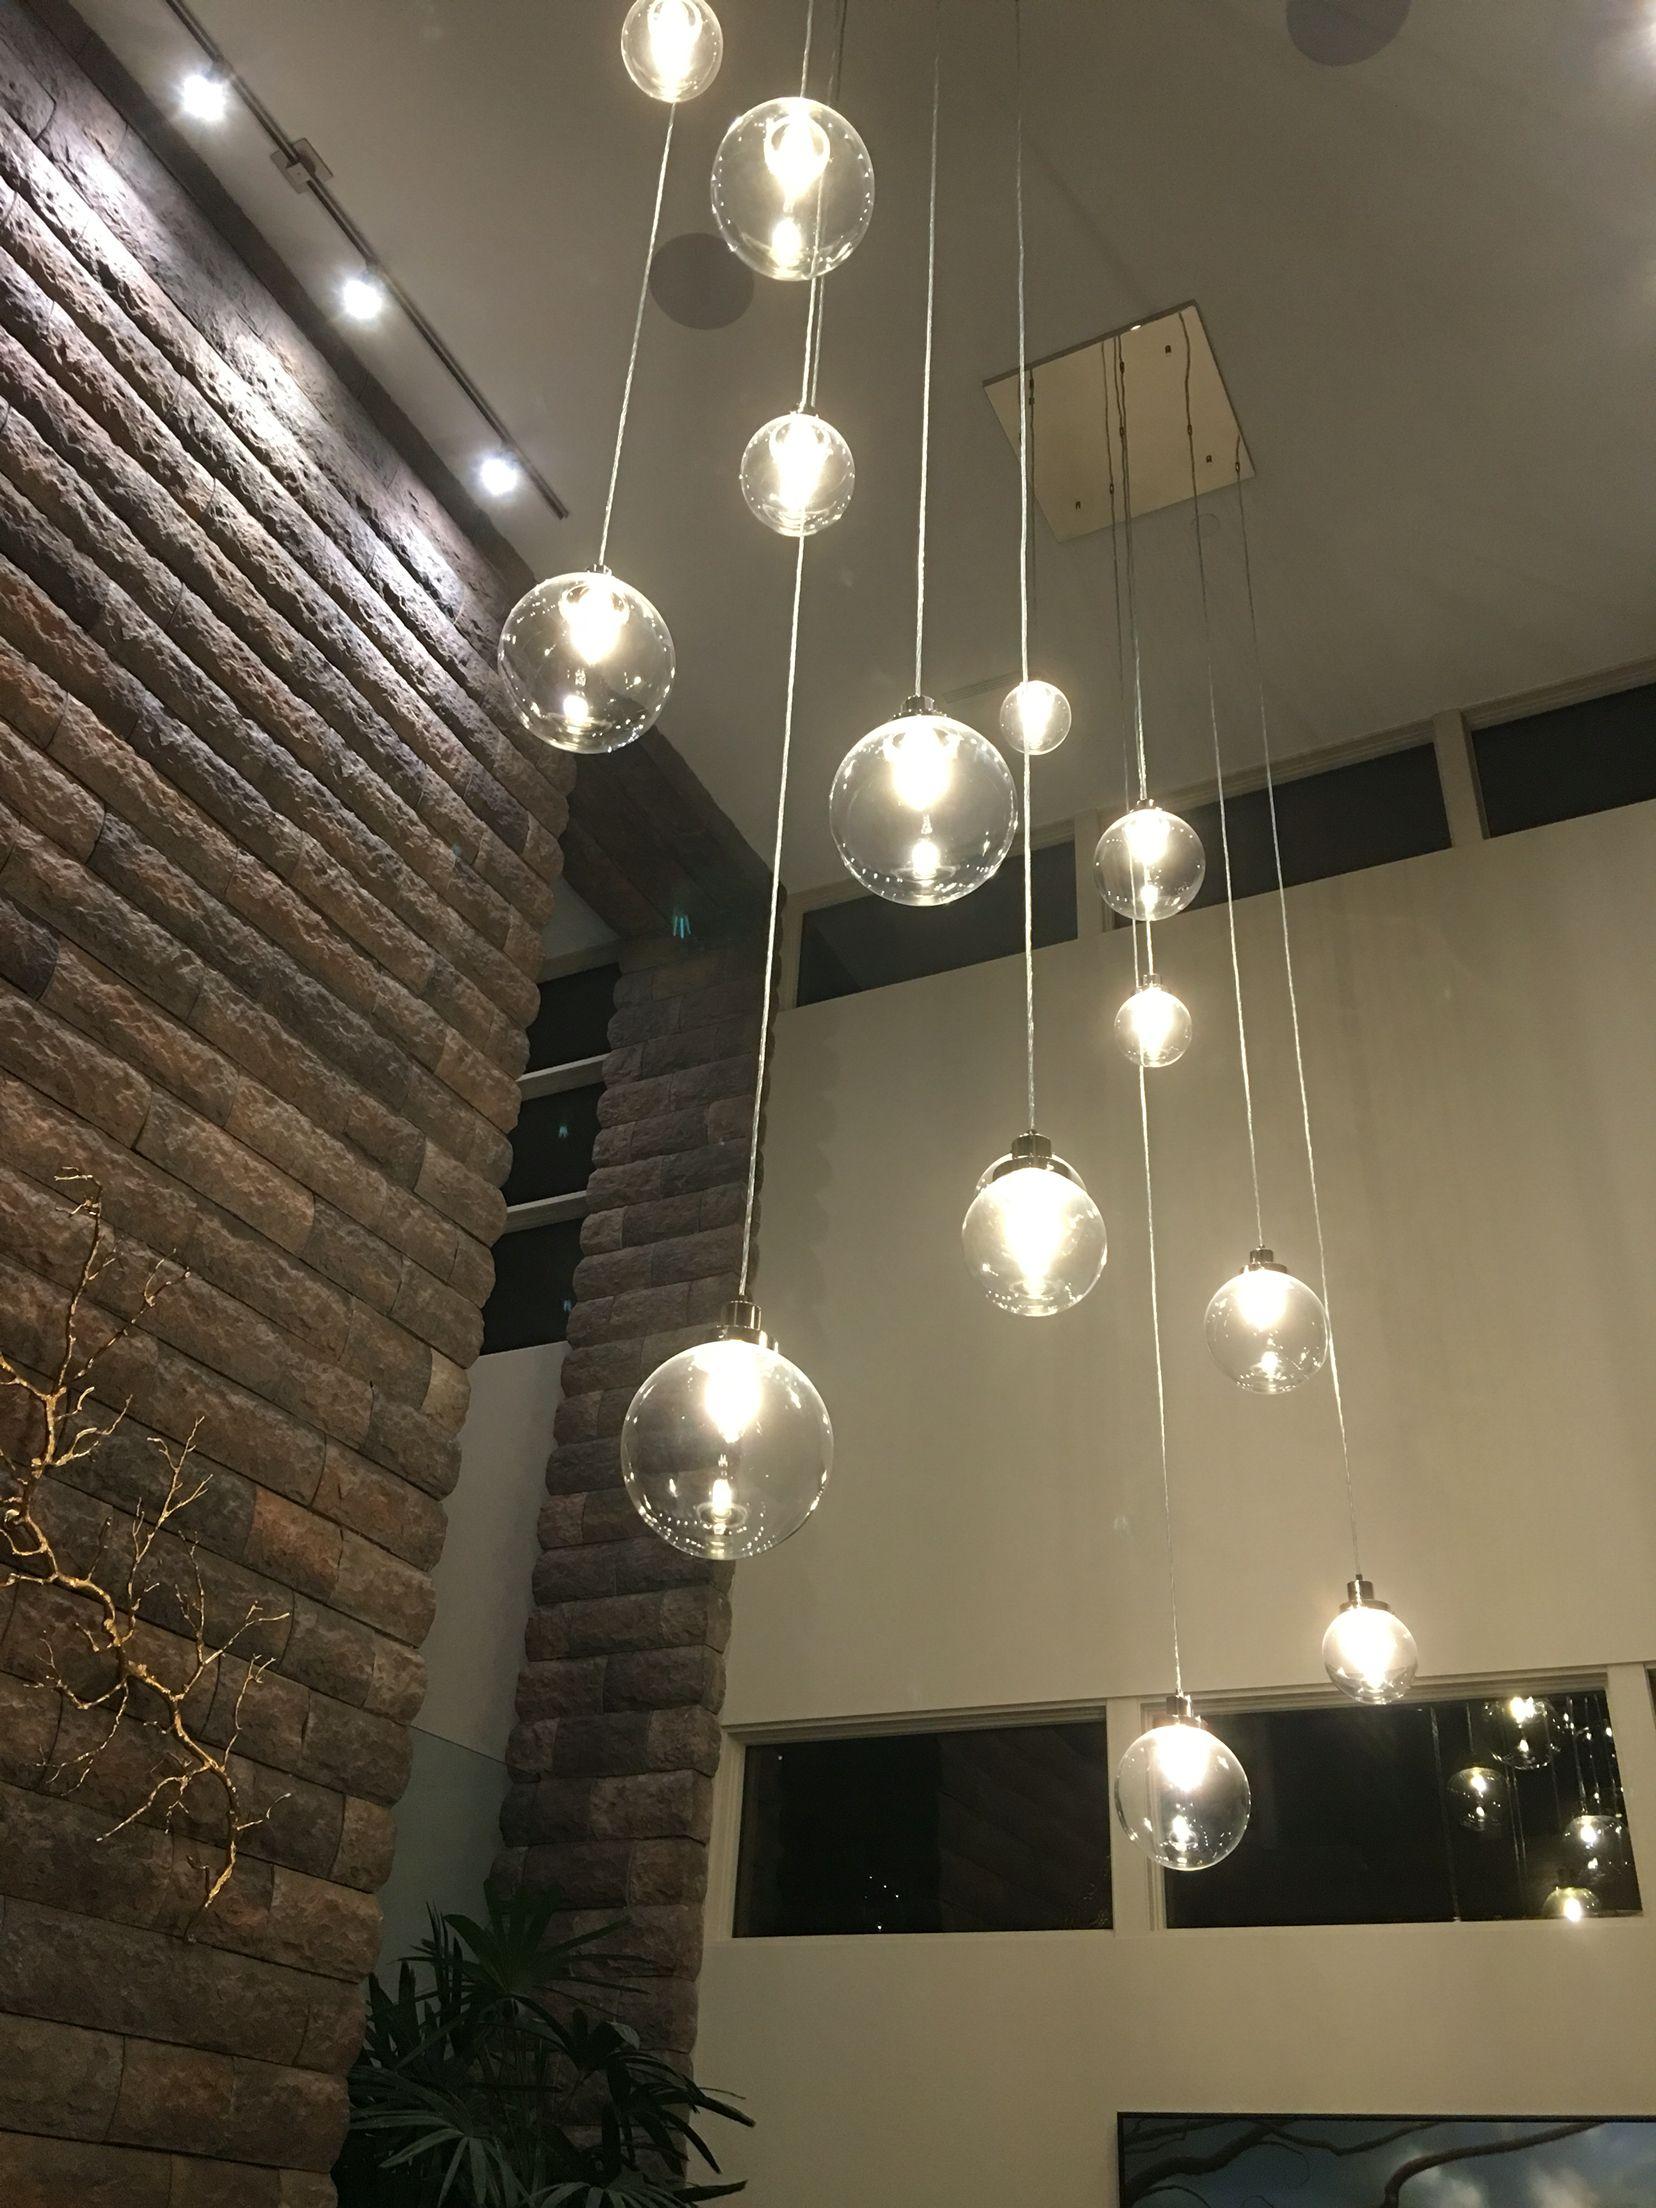 Stone wall and perfect lighting fixture kbis2016 tnah2016 blogtourkbis